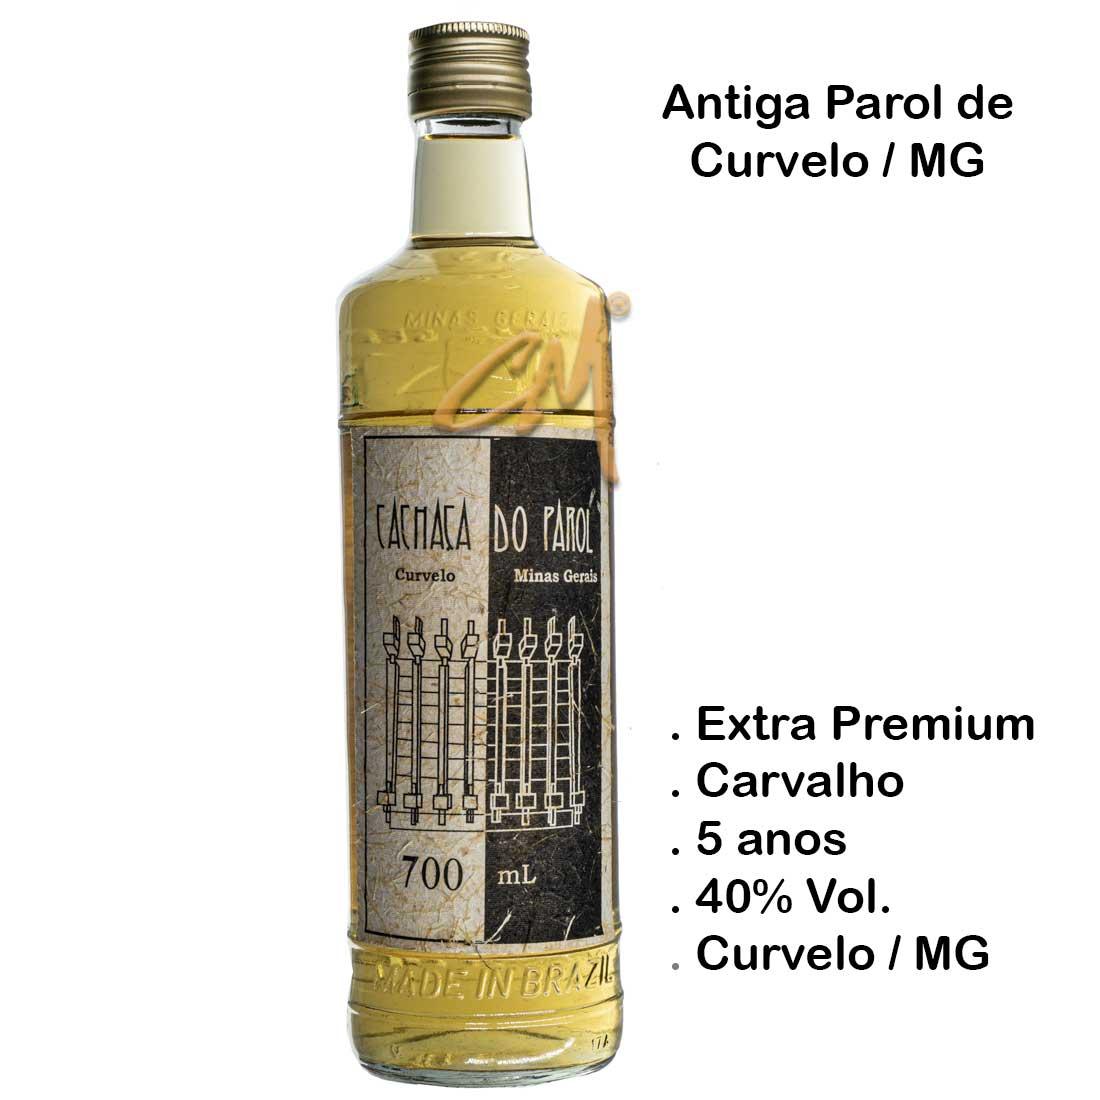 Cachaça Do Parol 700 ml - Antiga (Curvelo / MG)